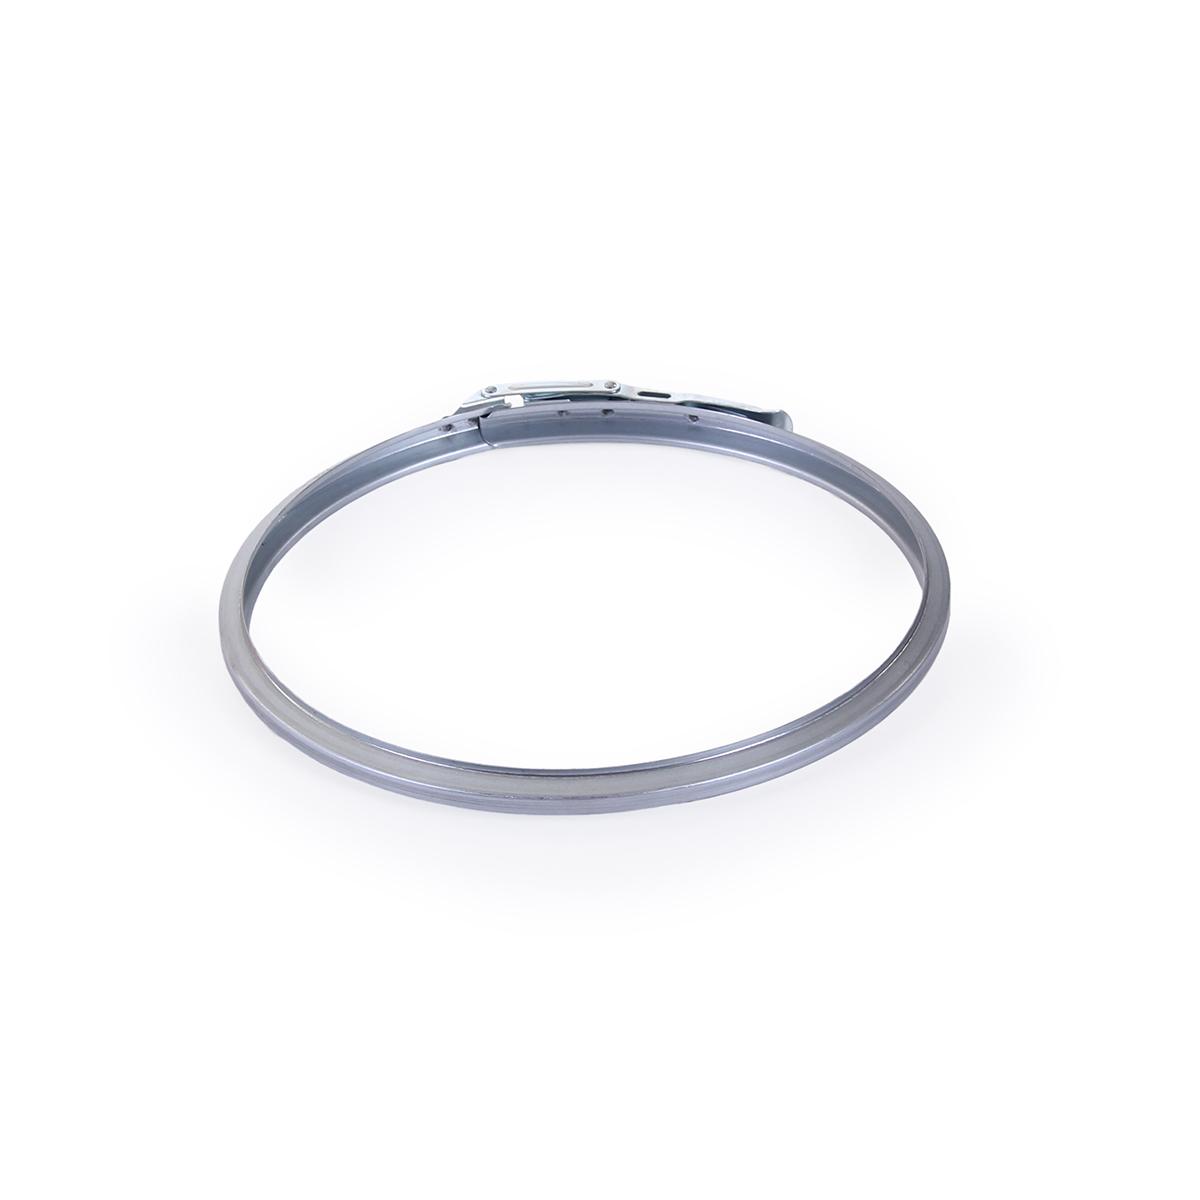 Ring zu Obstfass 30